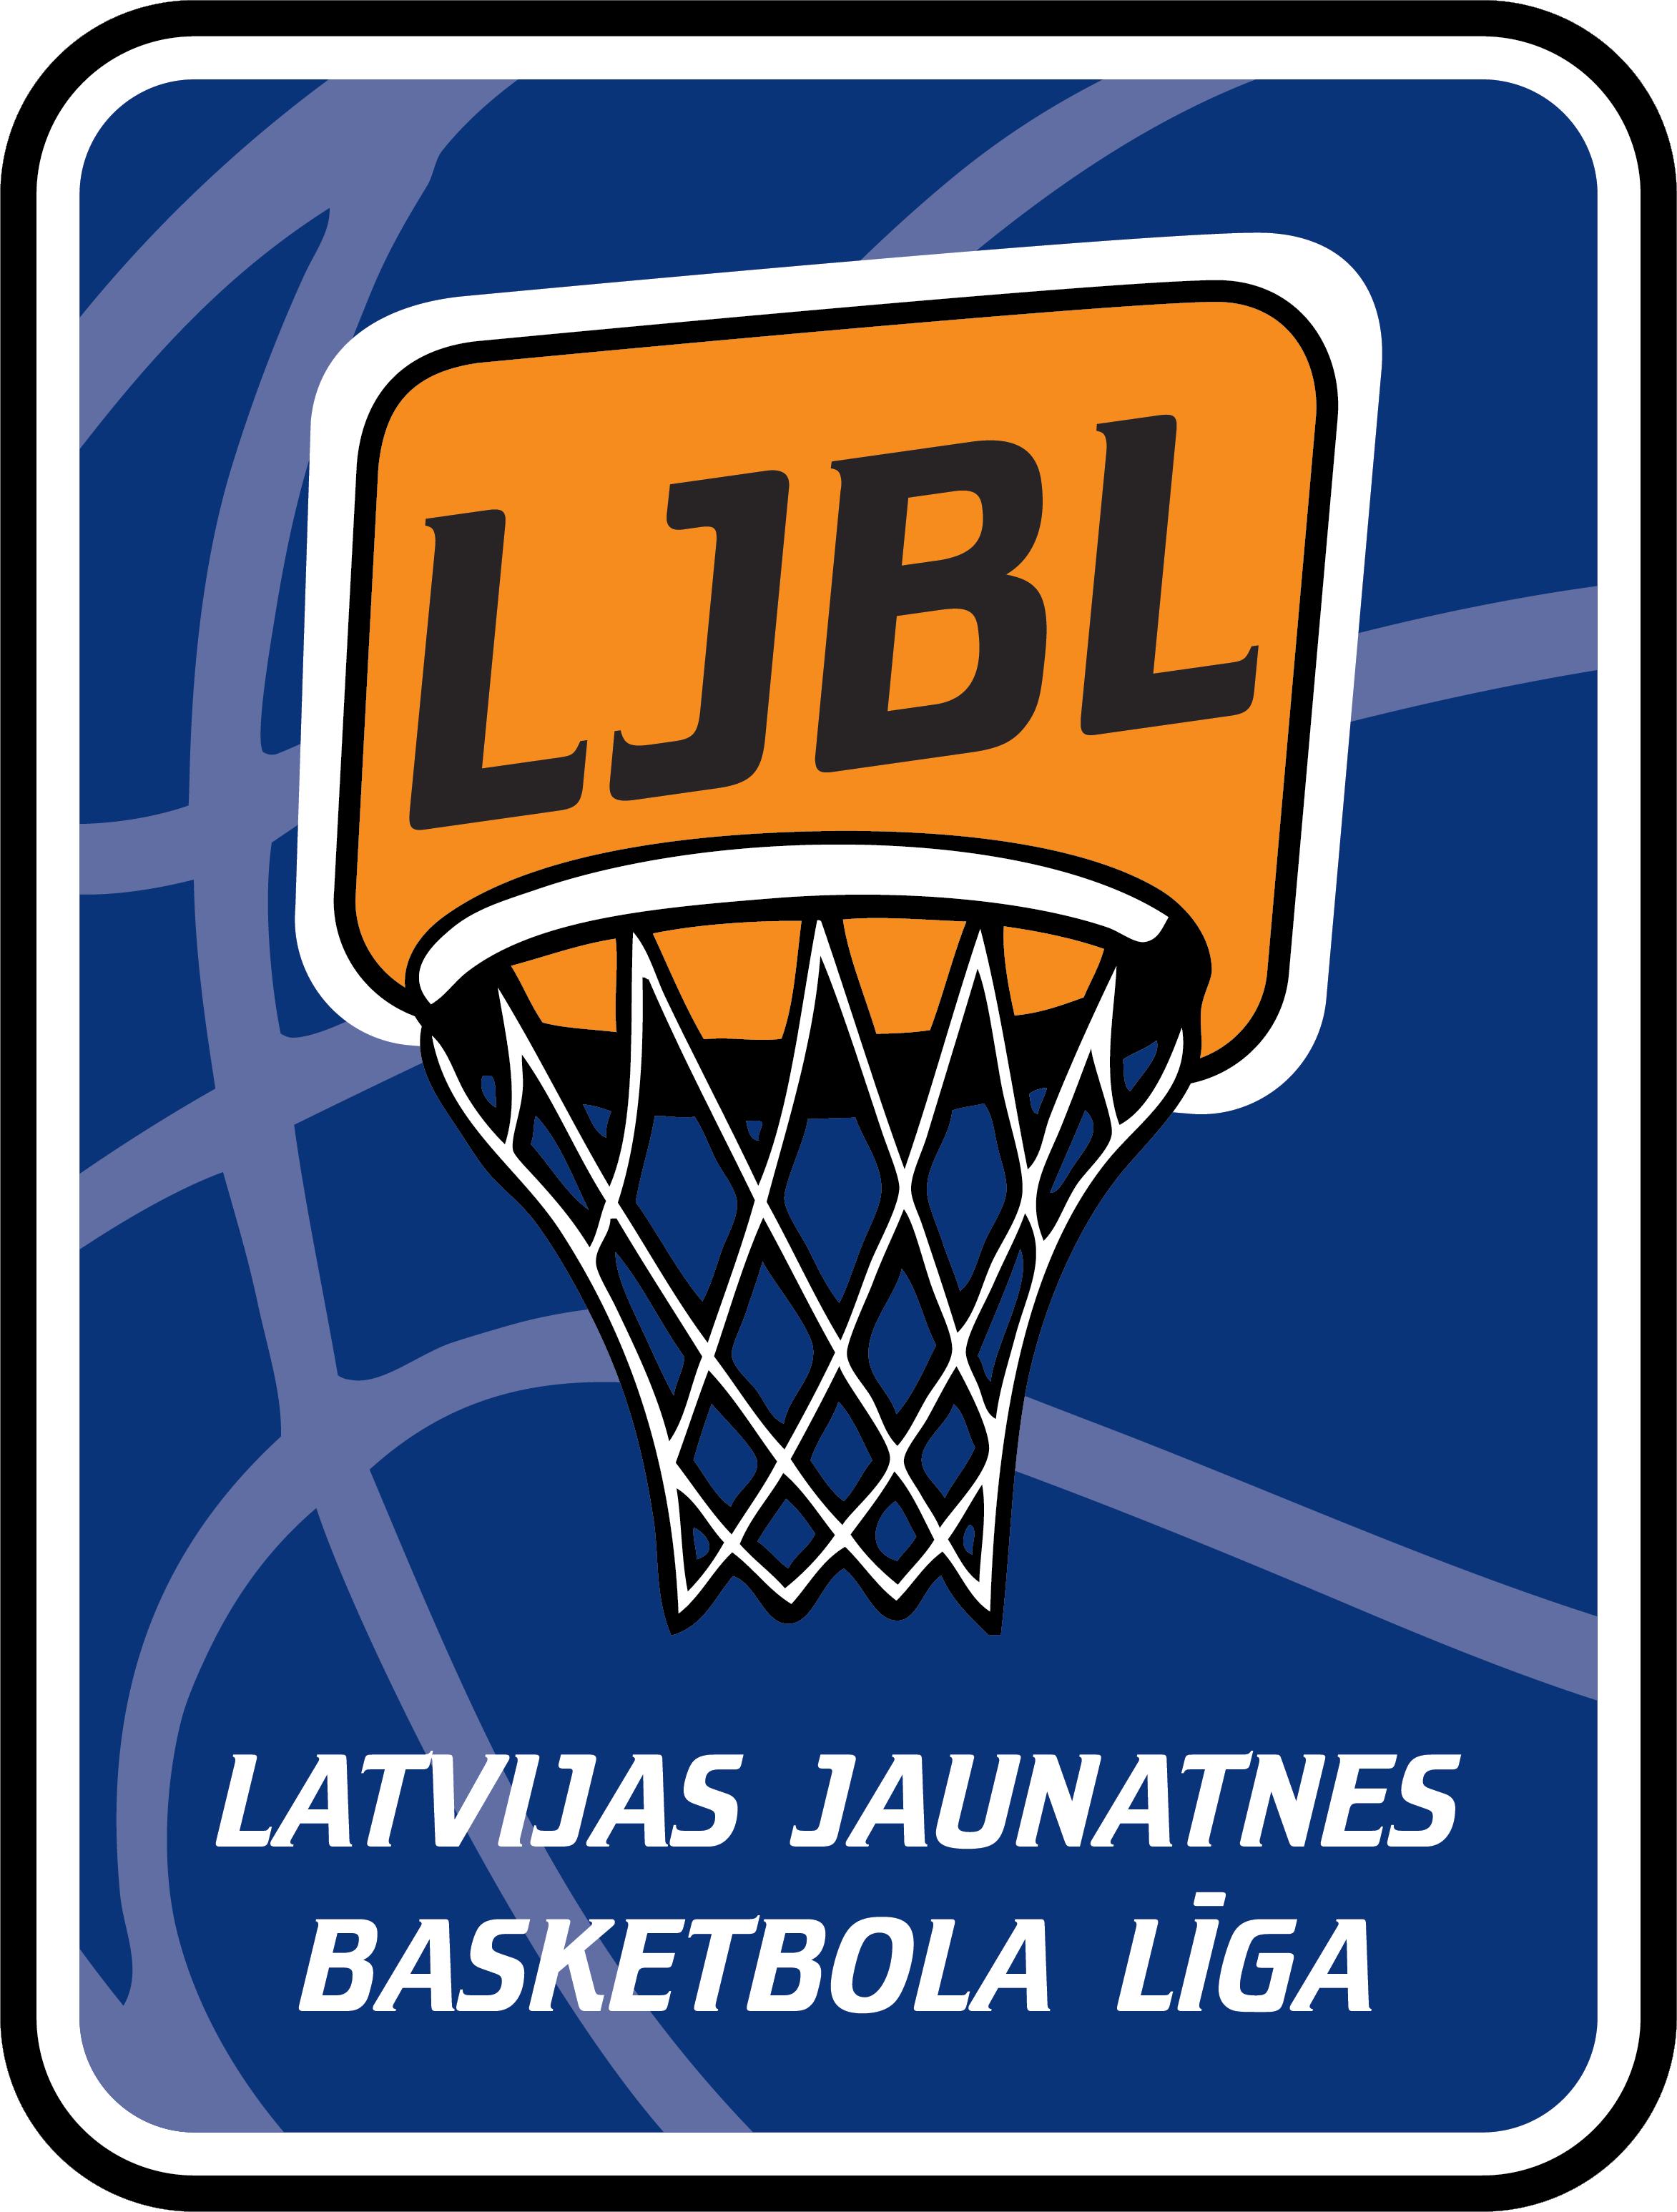 ljbl logo